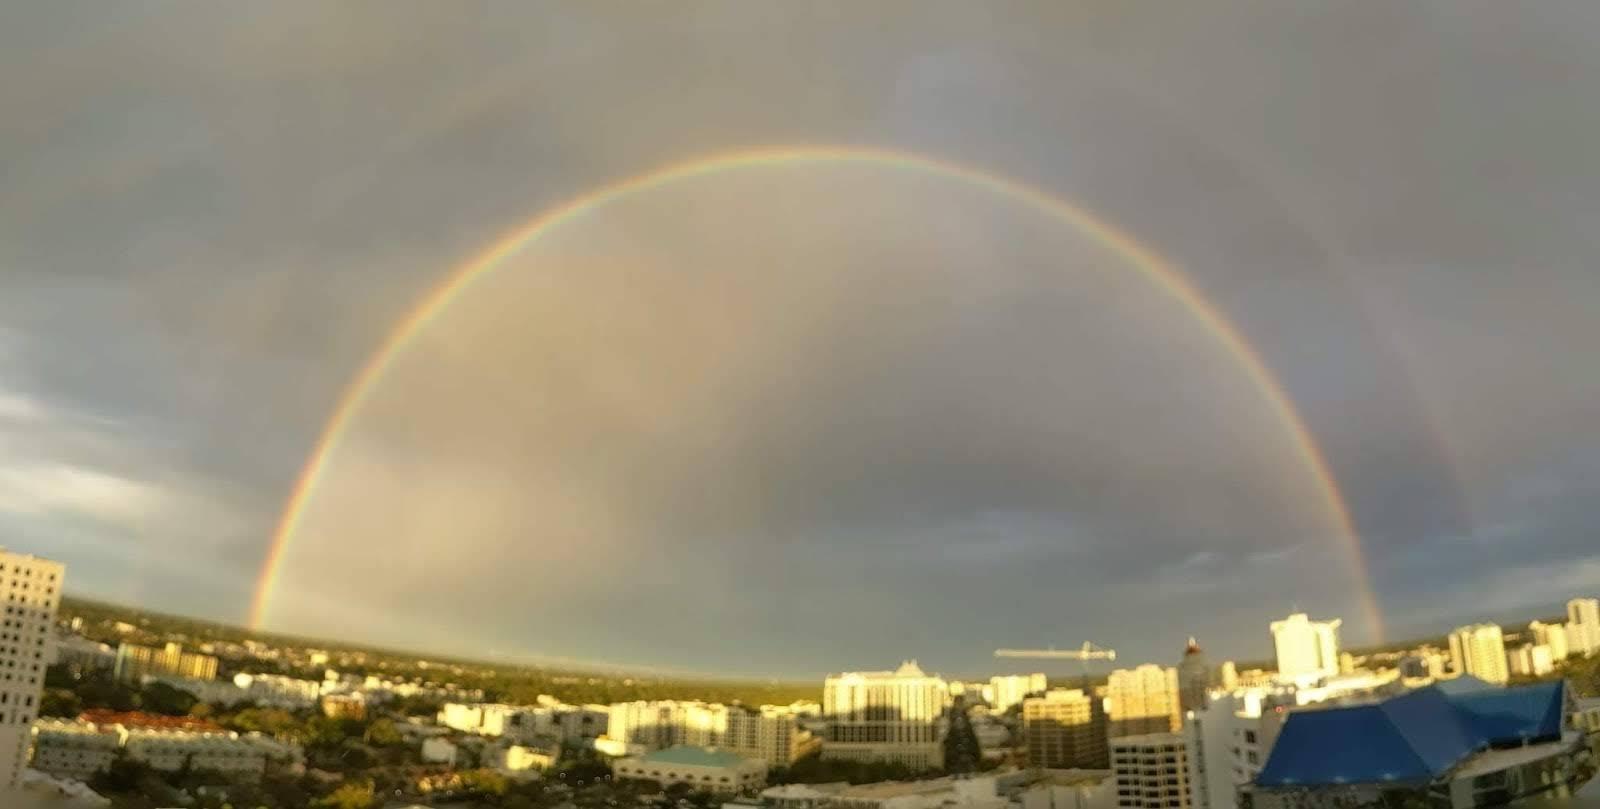 Rainbow Over Sarasota Feb 2019